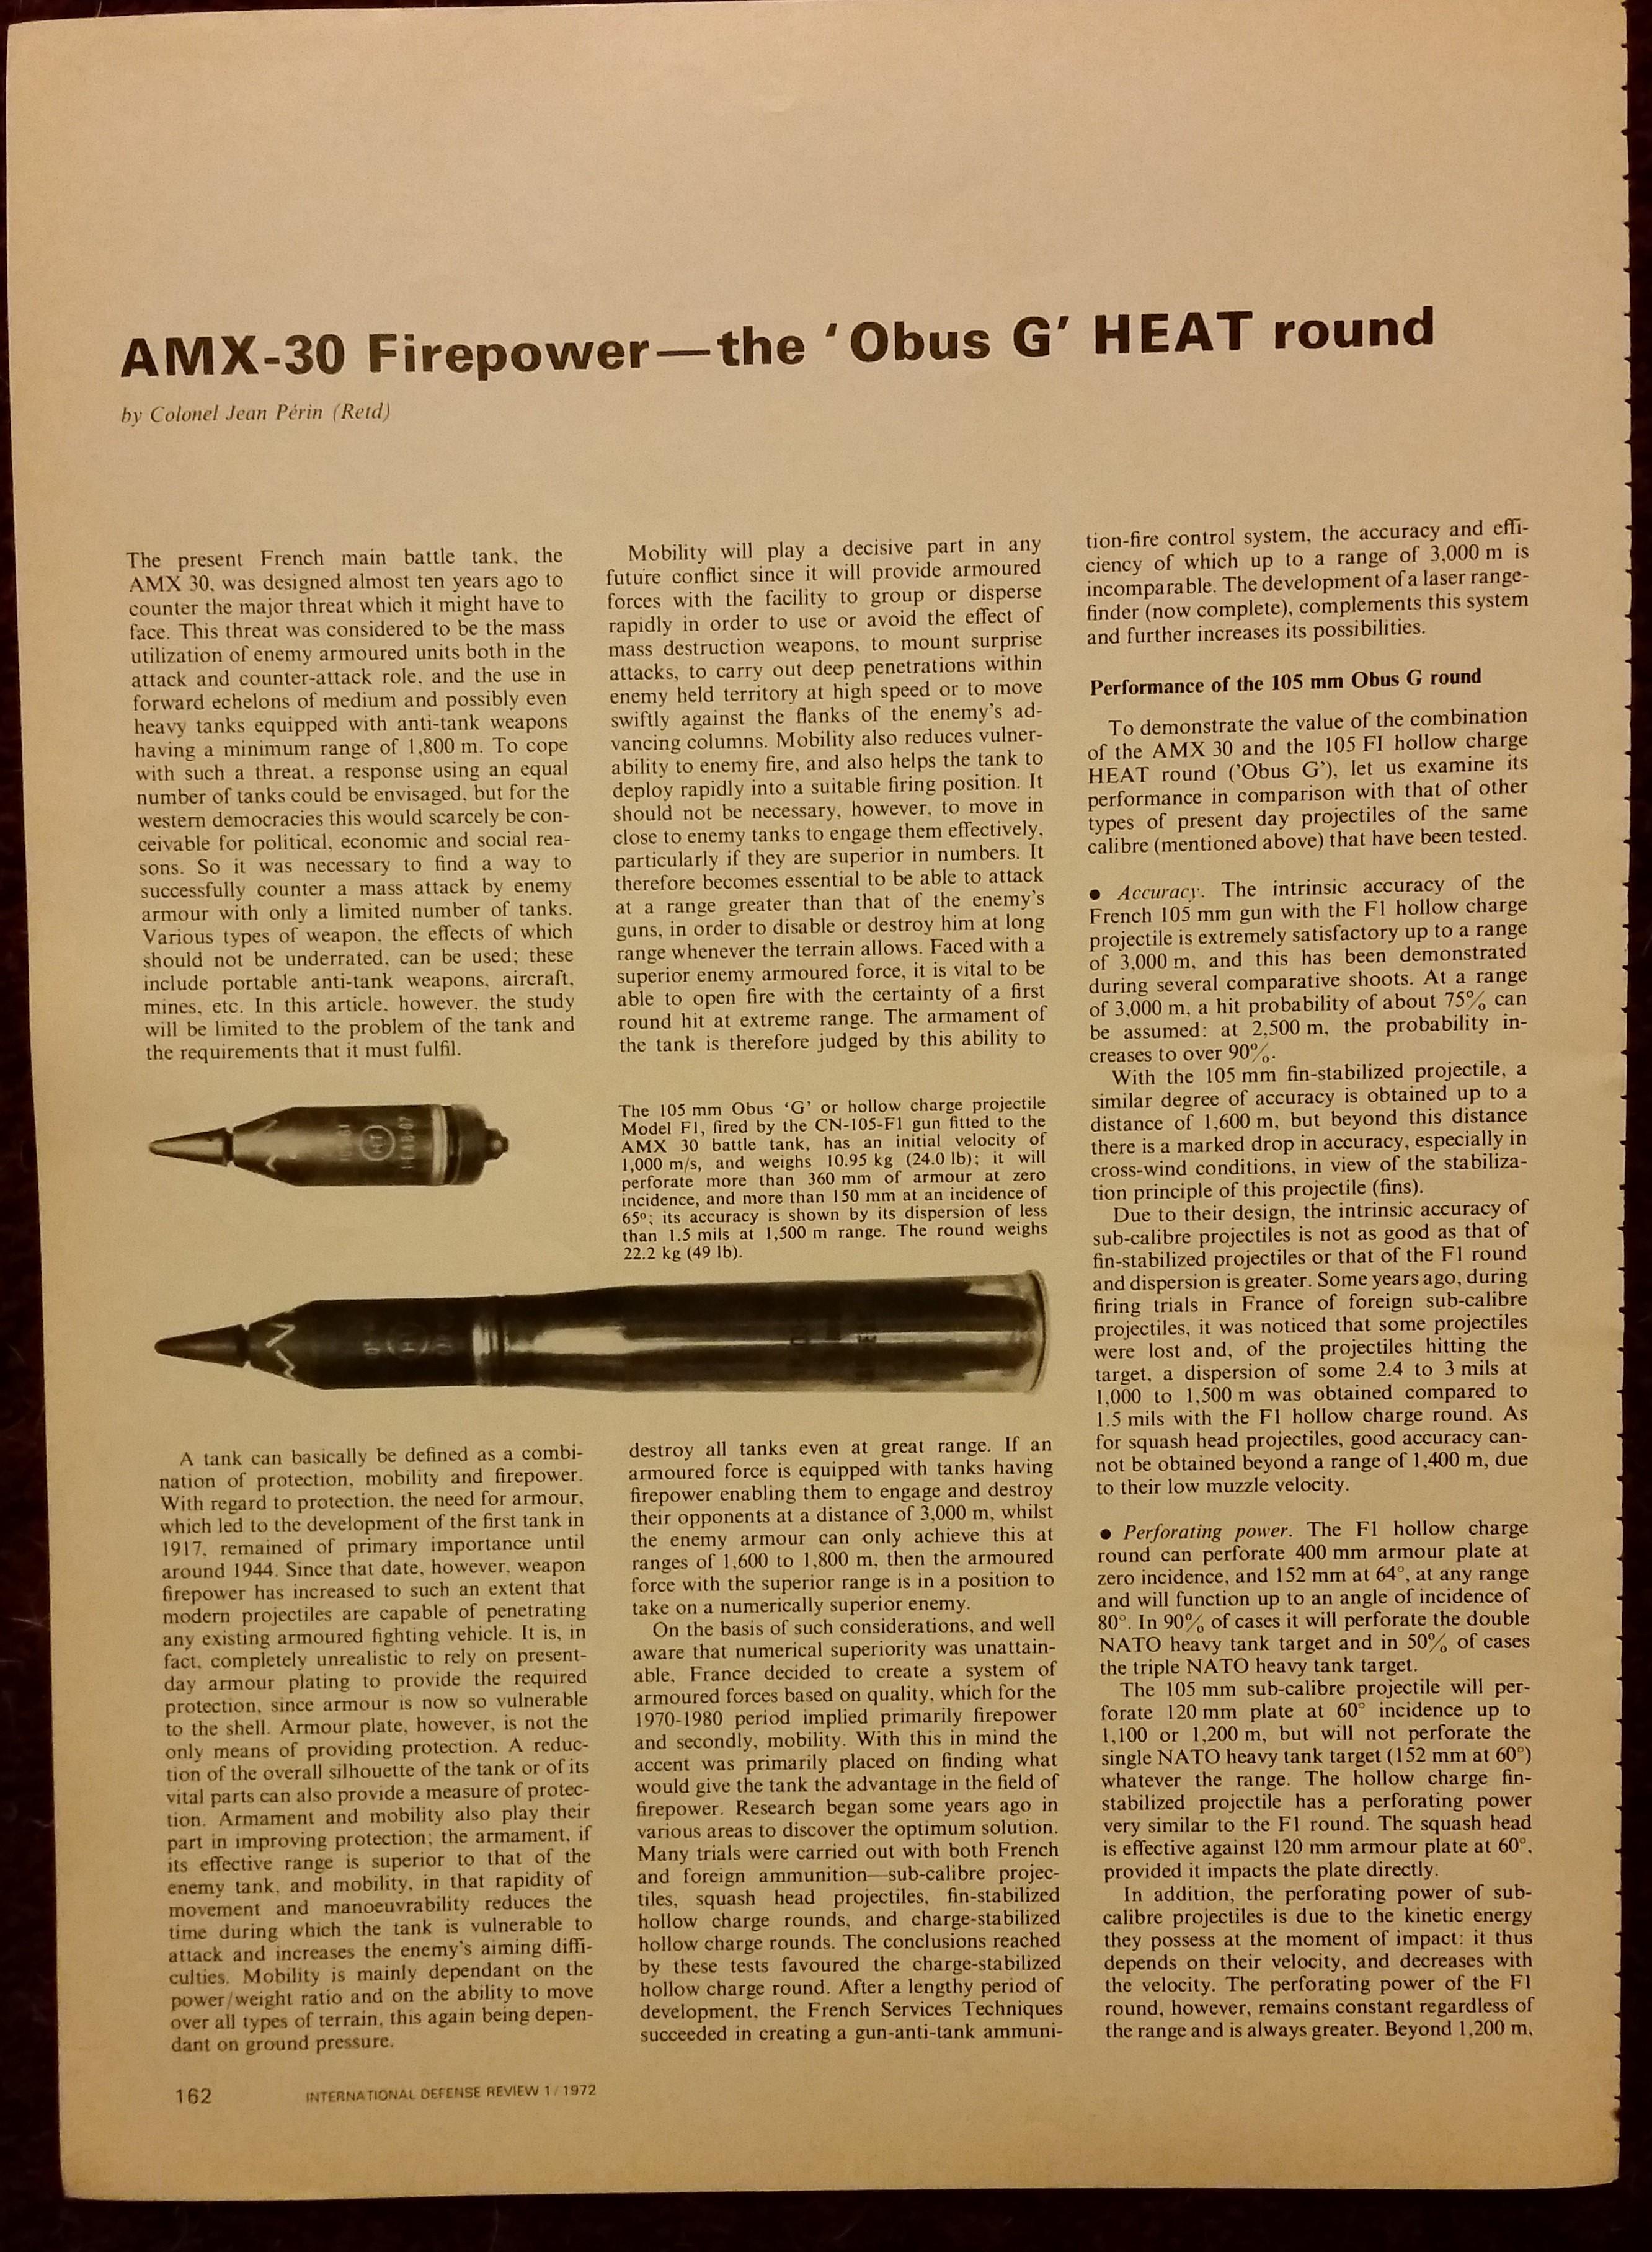 https://tankandafvnews.files.wordpress.com/2015/04/amx30-firepower-obus-g-heat-round-page-1-e1428293708533.jpg